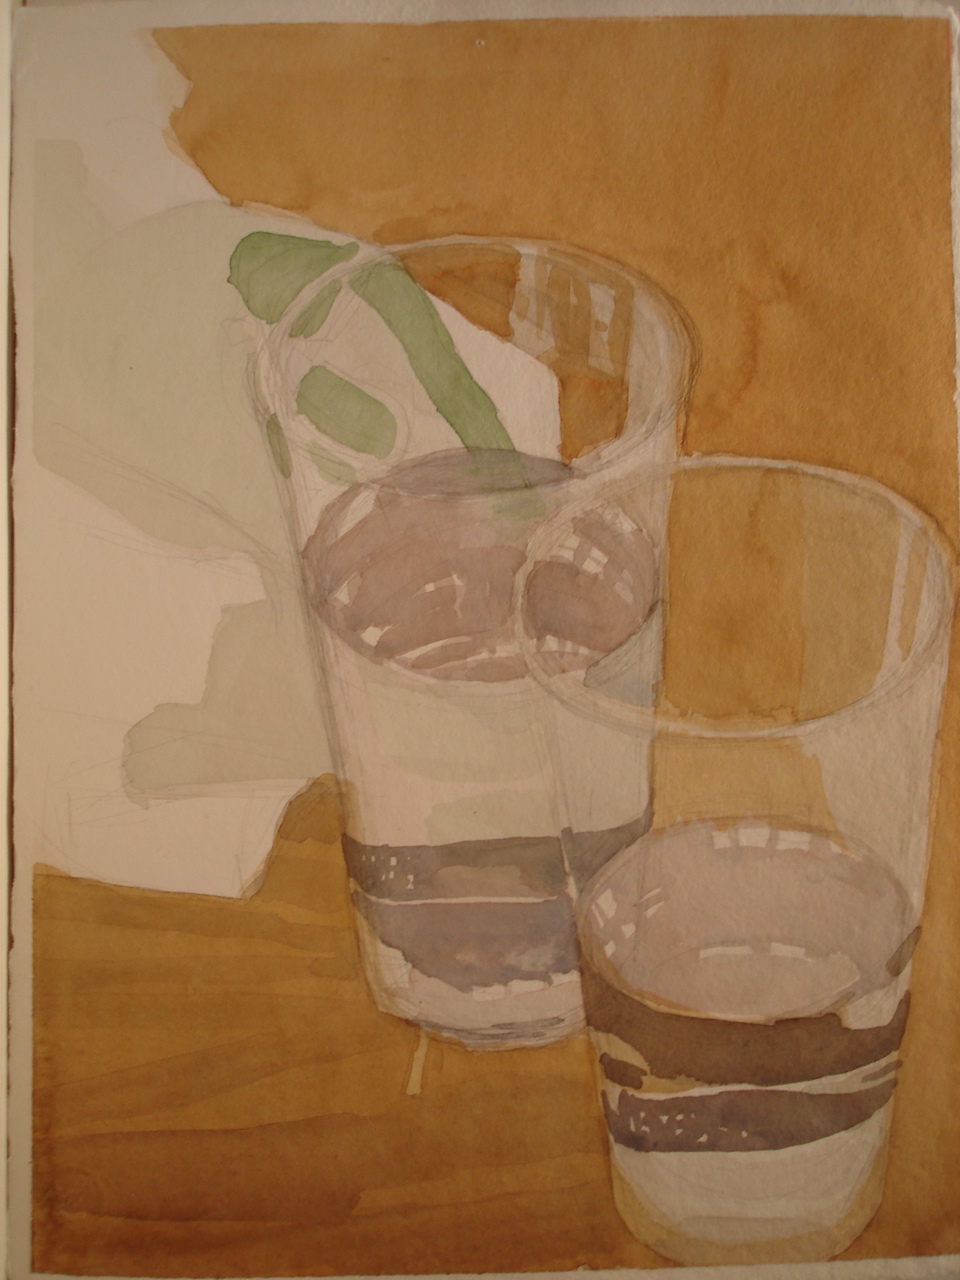 Watercolor on paper 11 x 14 inches Tarek Ashkar,2005